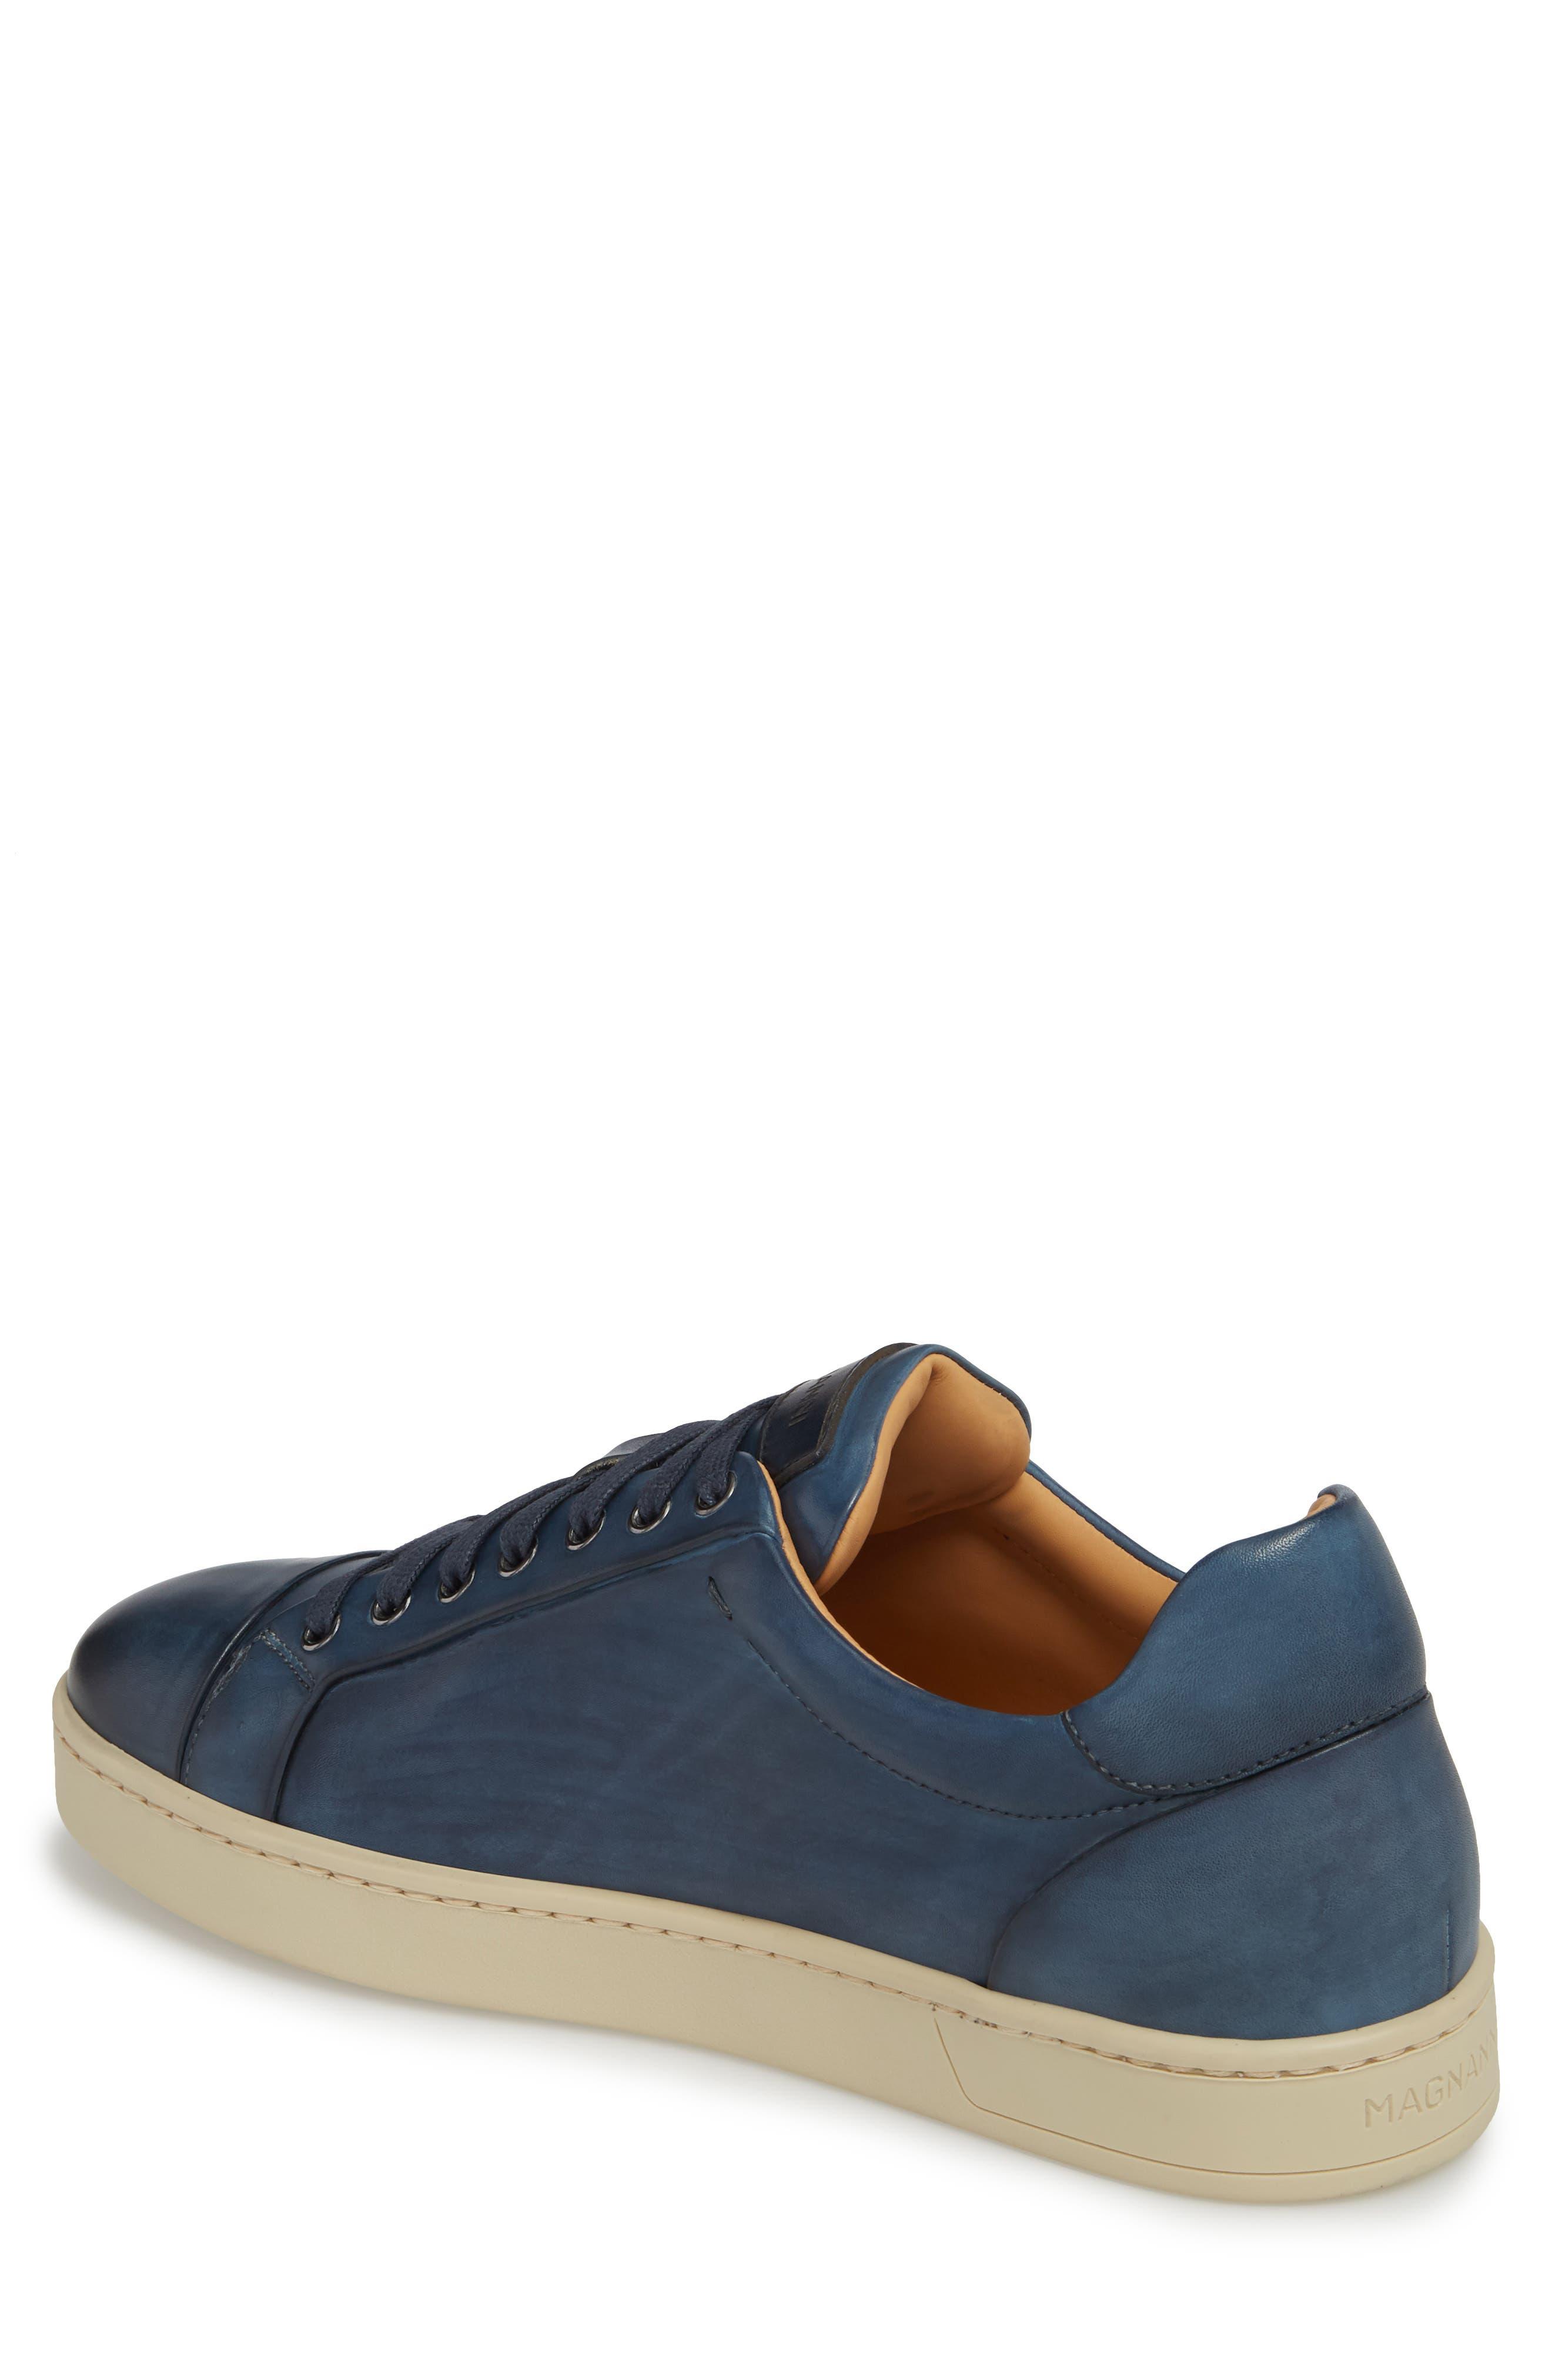 Erardo Low Top Sneaker,                             Alternate thumbnail 2, color,                             BLUE LEATHER